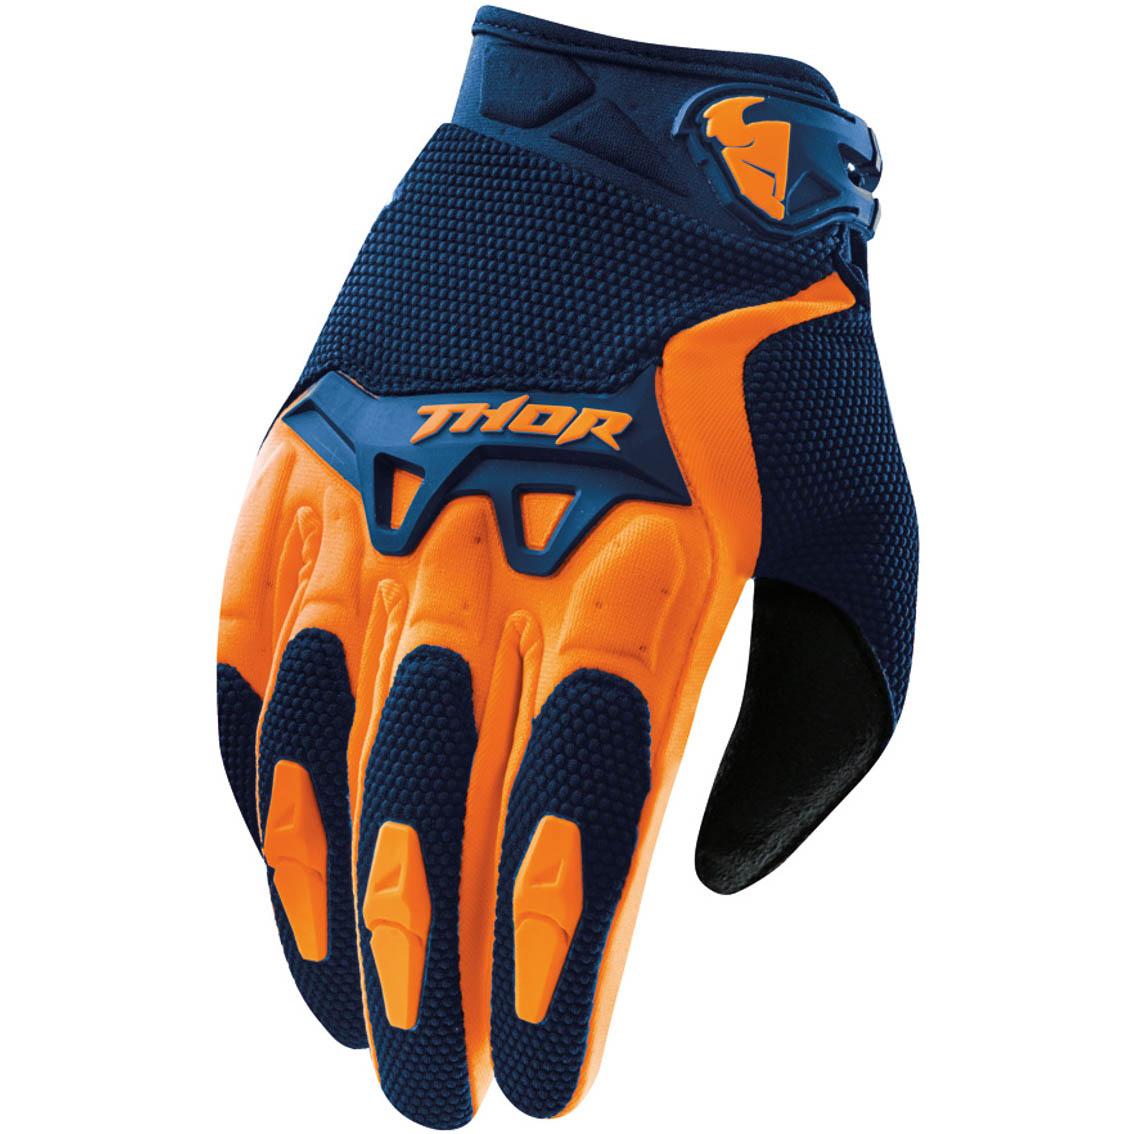 Thor - Spectrum Navy/Orange перчатки, сине-оранжевые